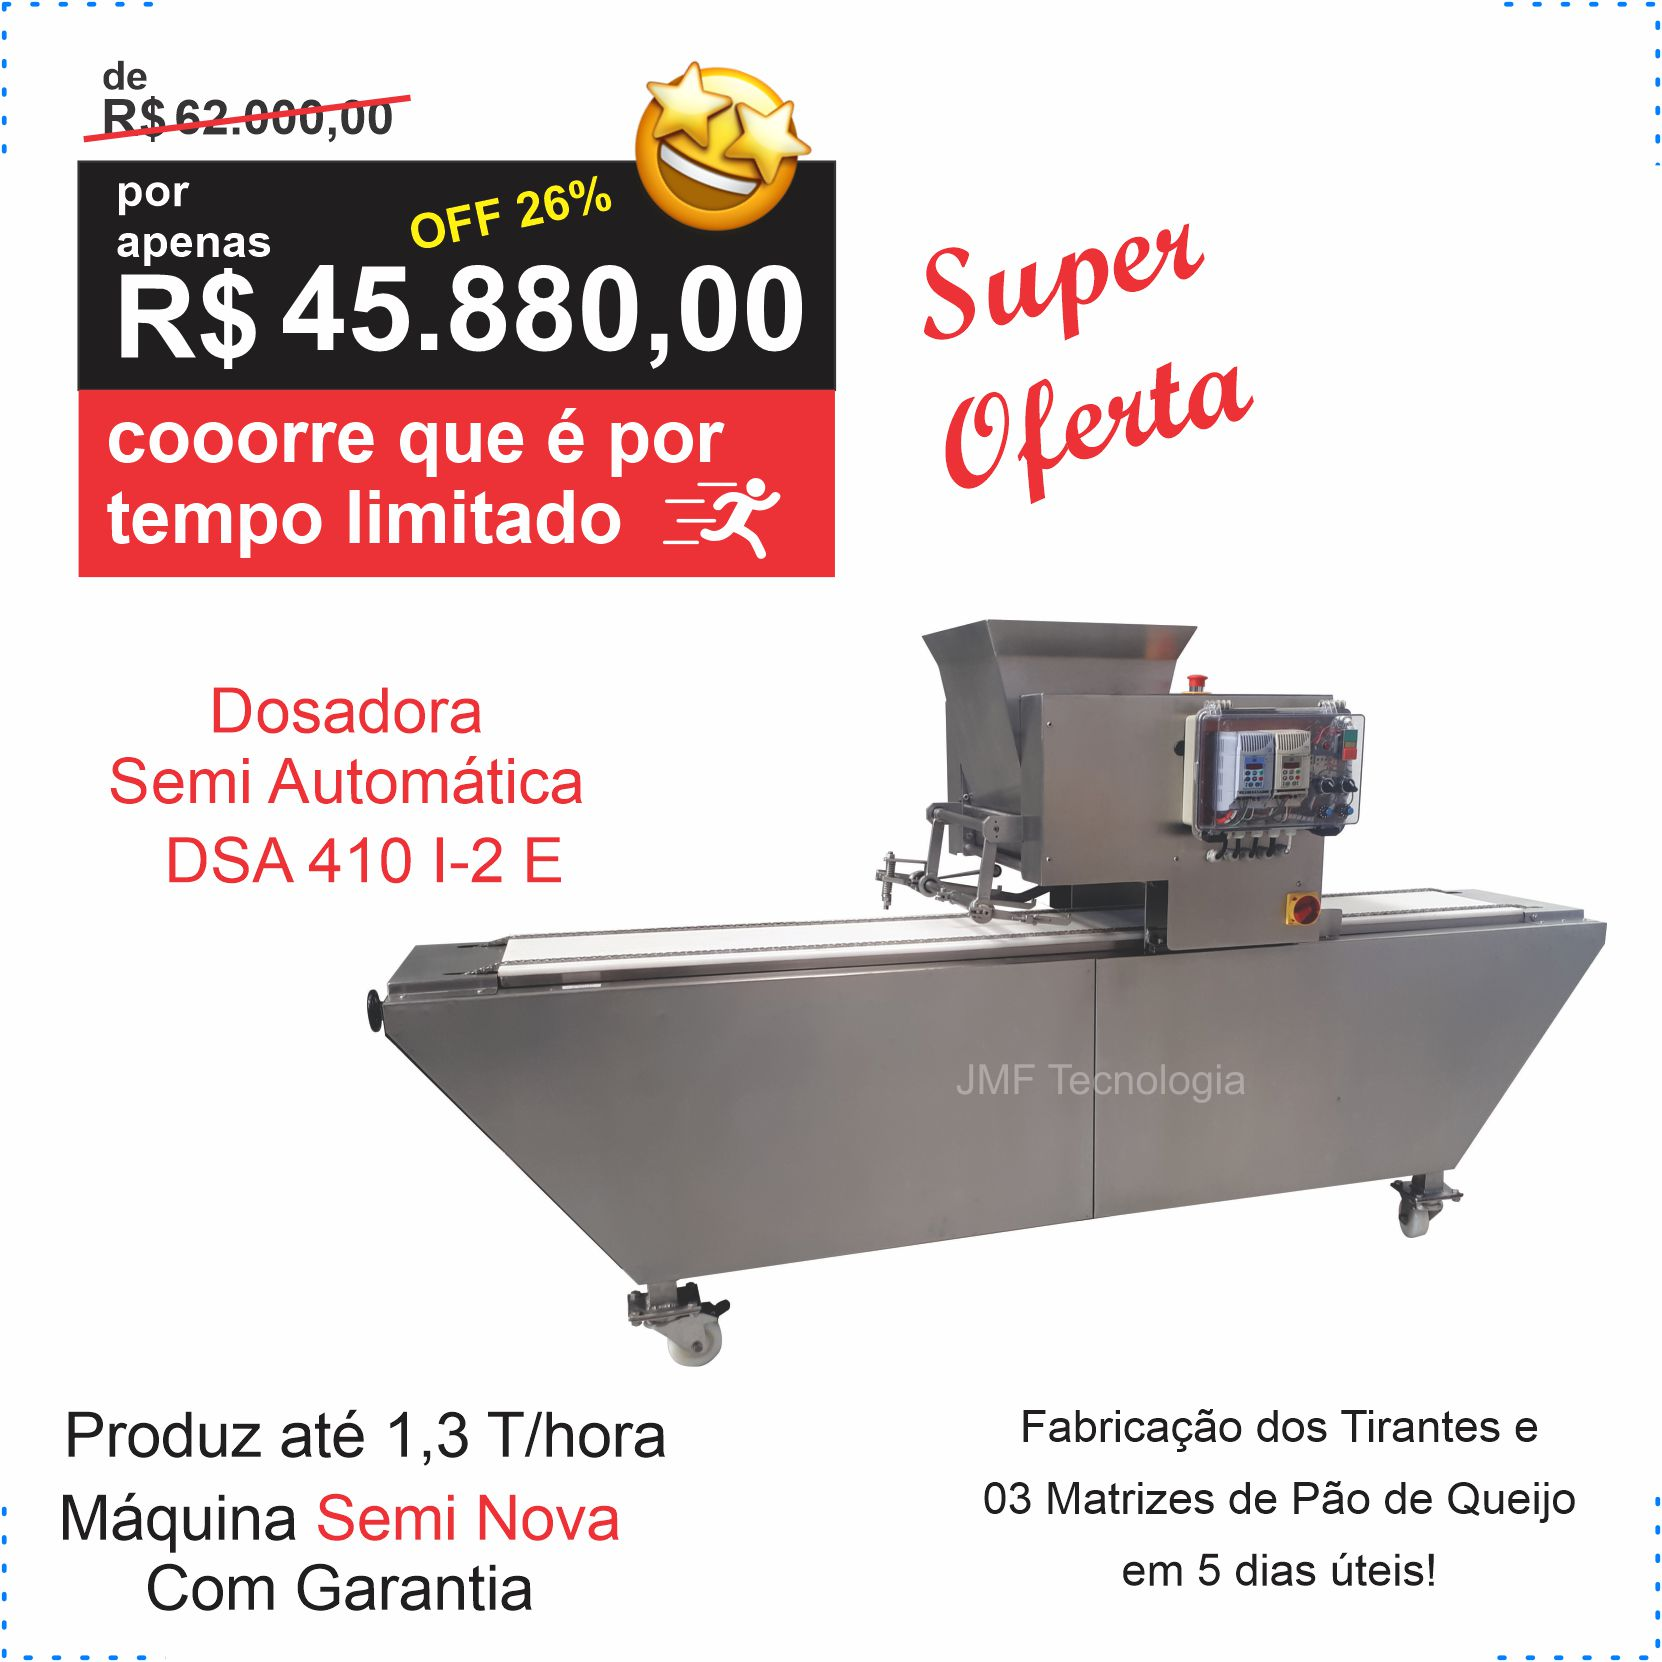 Dosadora Semi Automática INOX modelo DSA 410 I-2 E – Semi Nova